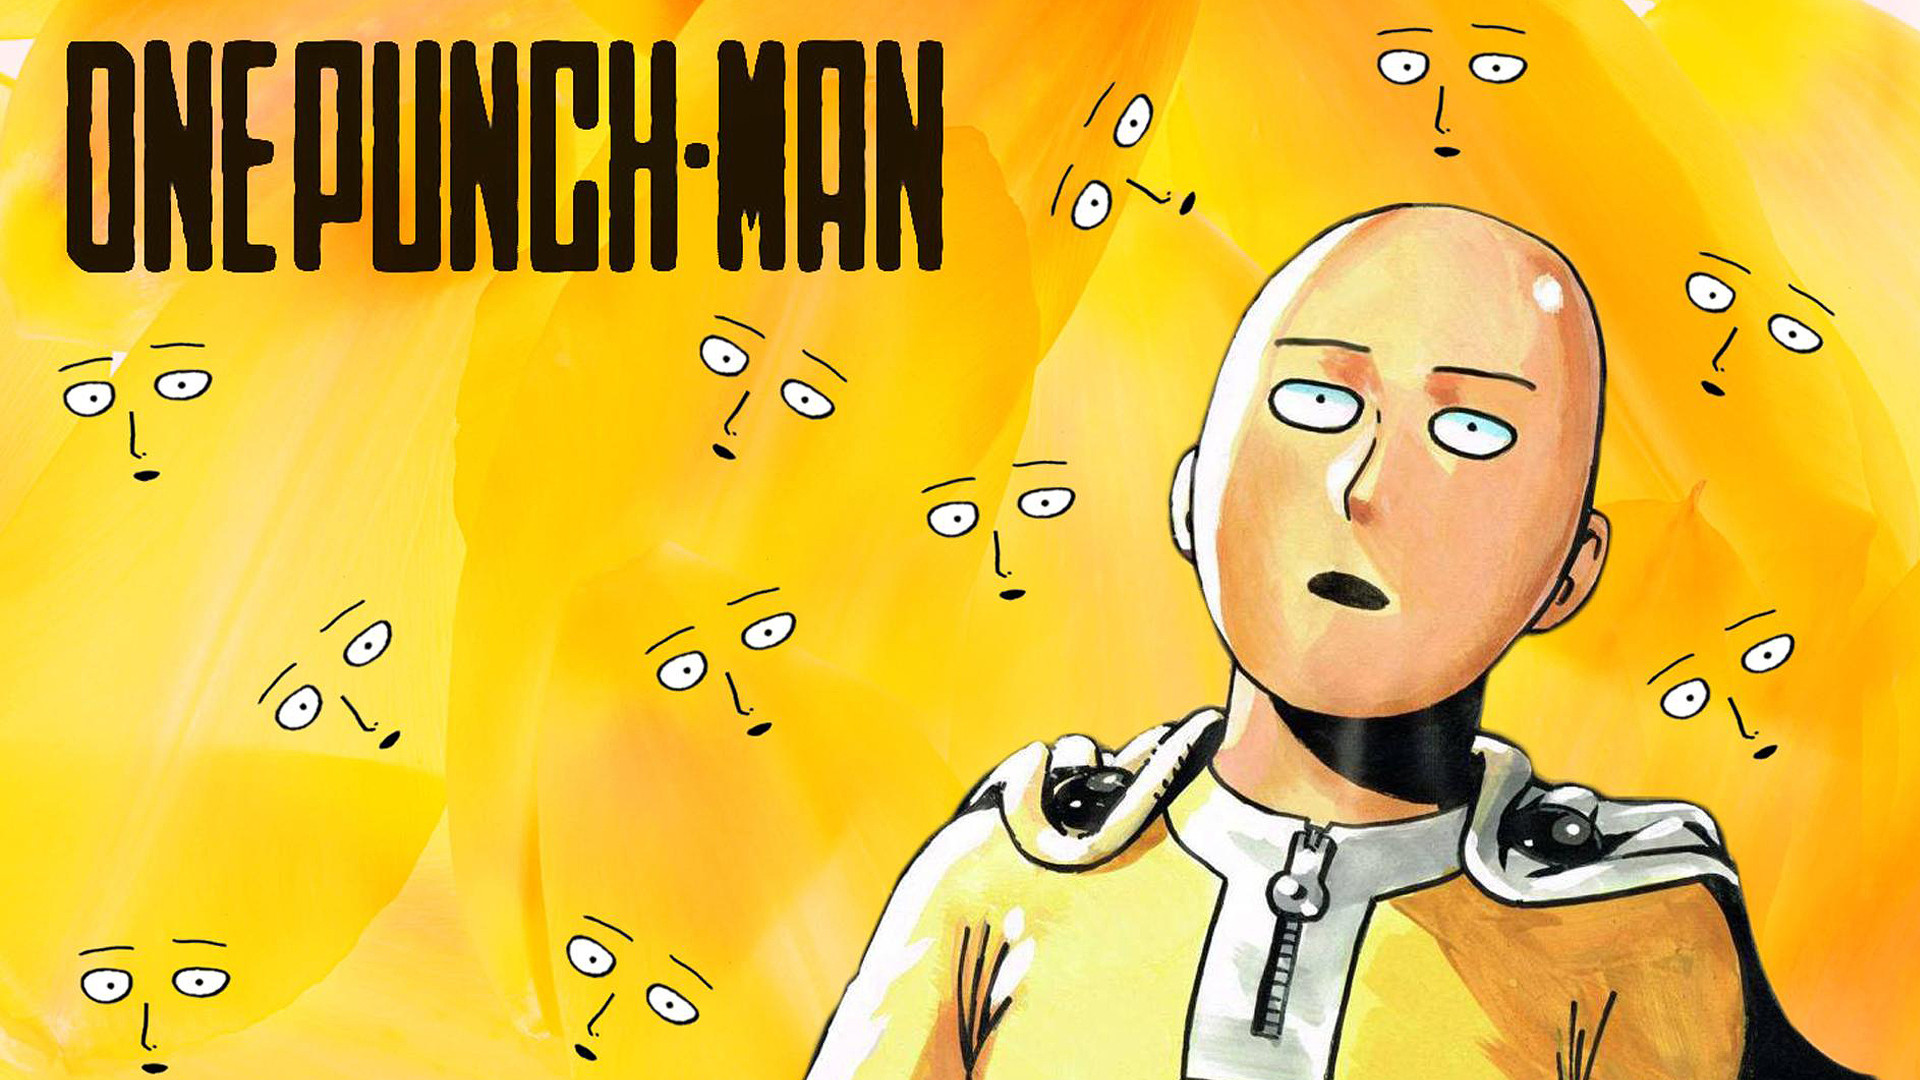 Аниме Ванпанчмен, One Punch Man - крутые обои на рабочий стол 10